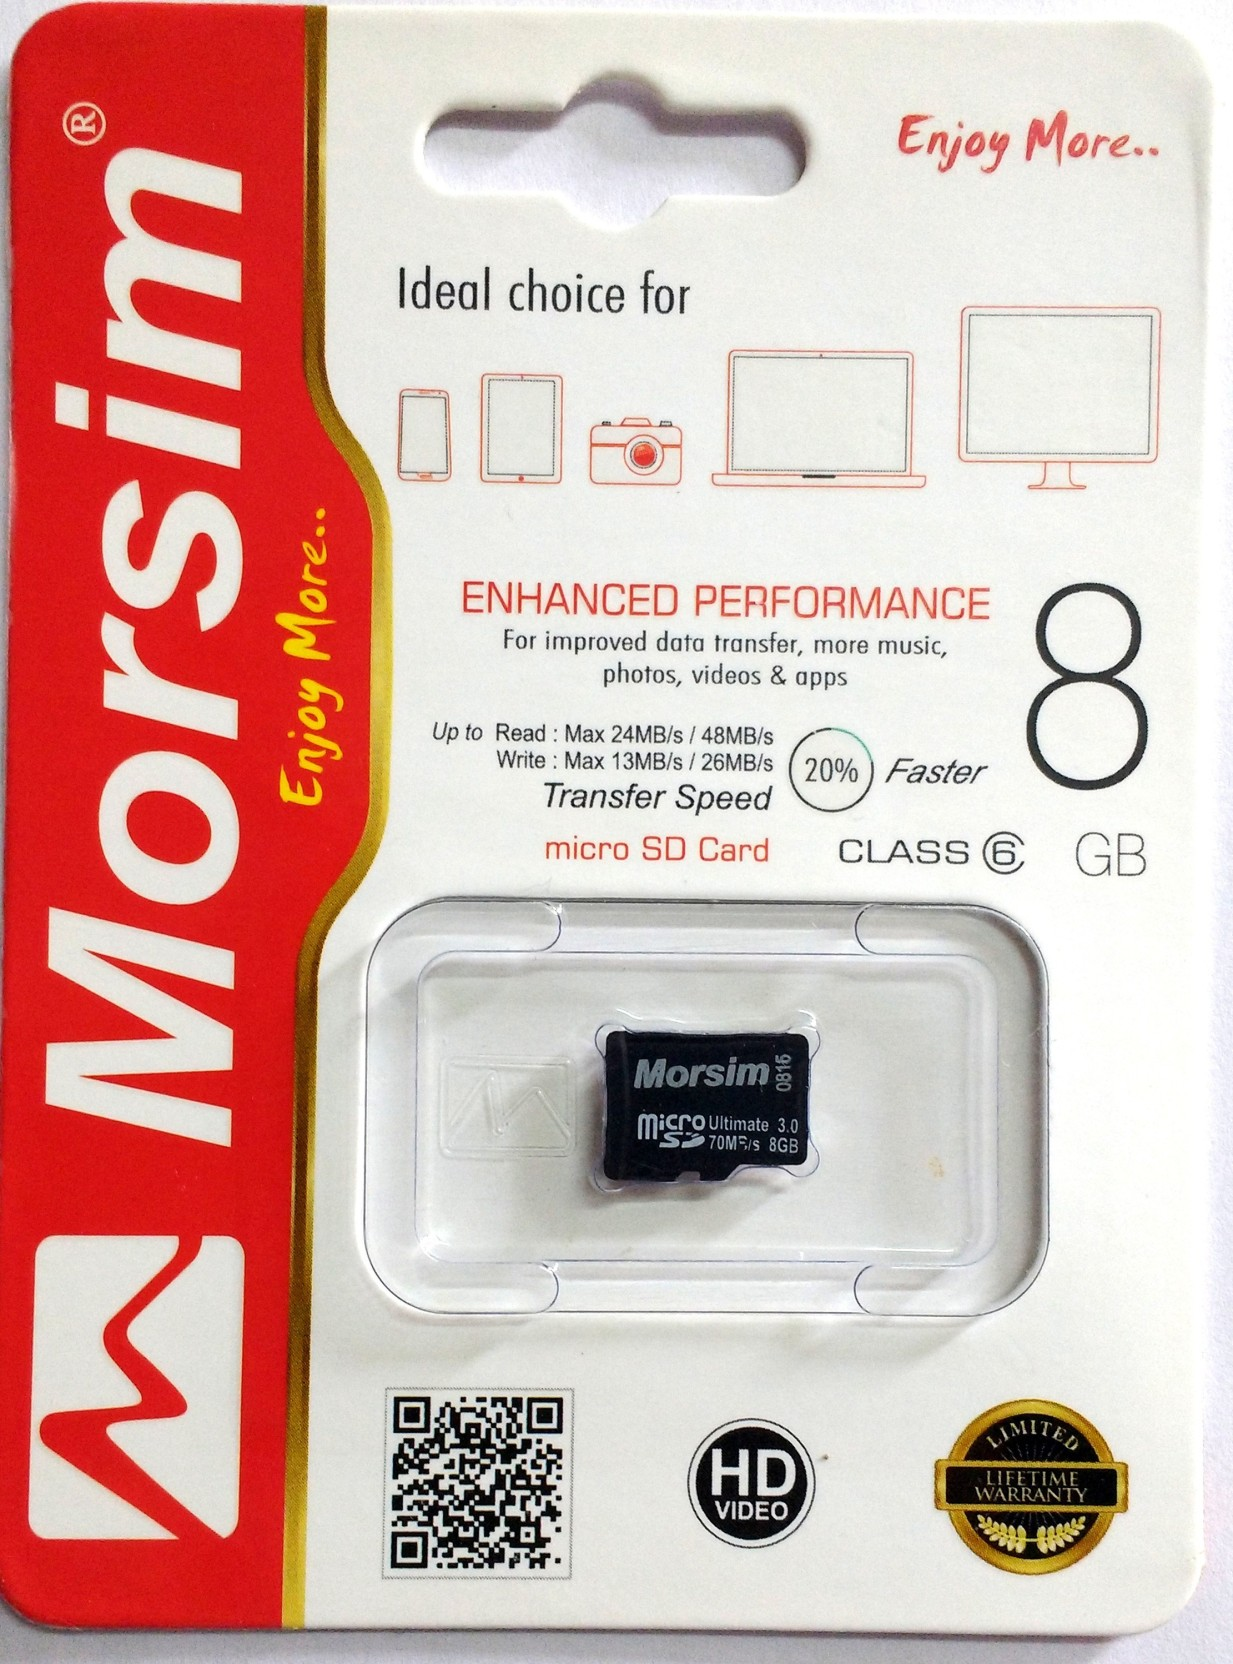 Morsim 8 Gb Microsd Card Class 6 48 Mb S Memory Samsung Micro Sd 4gb 10 Essential On Offer